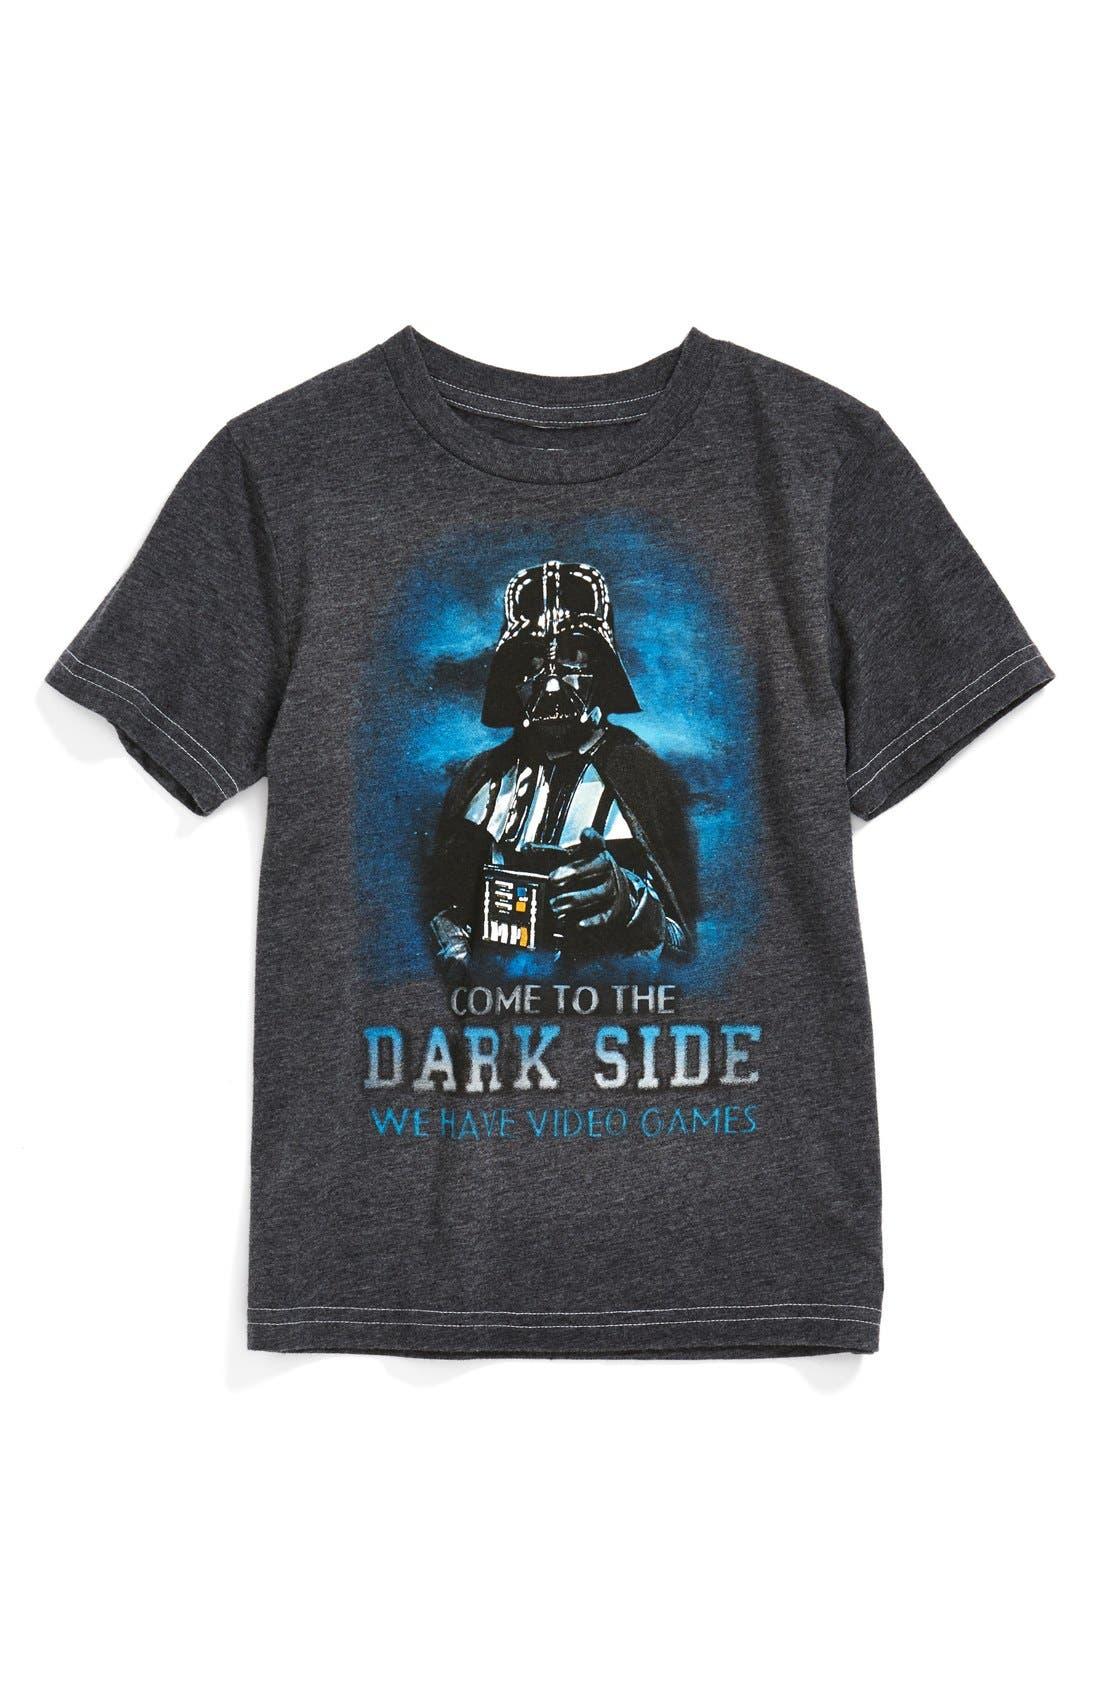 Main Image - Jem 'Dark Side Darth' T-Shirt (Toddler Boys & Little Boys)